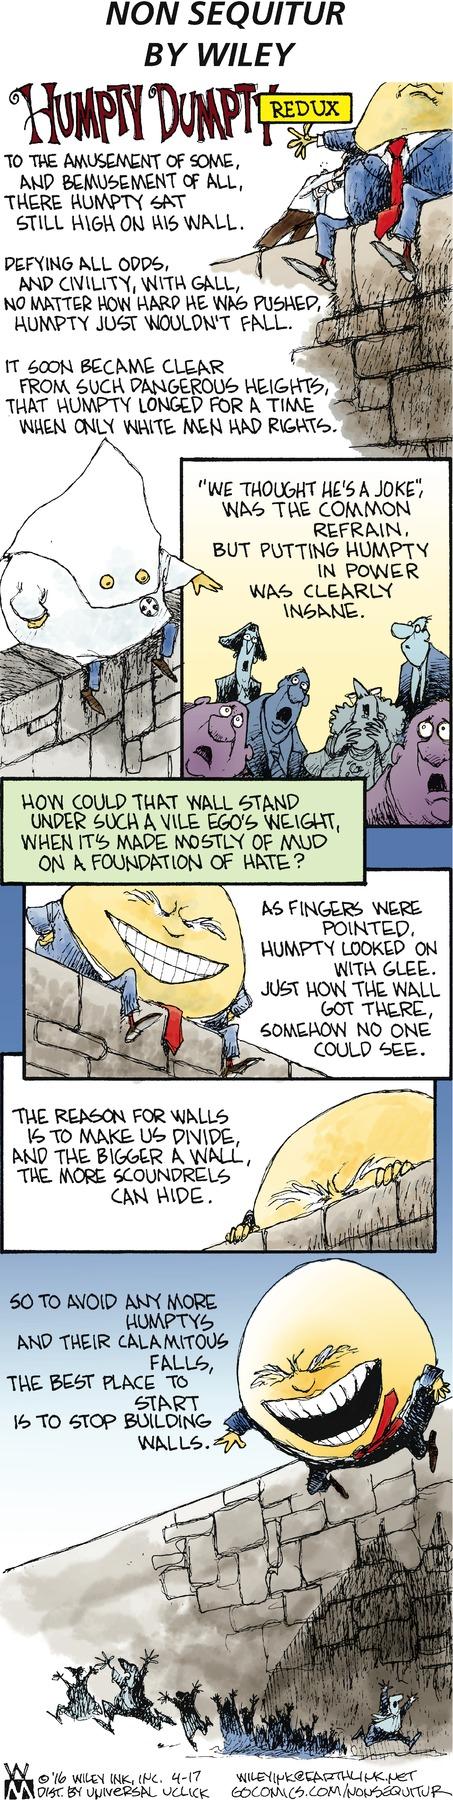 Non Sequitur Comic Strip for April 17, 2016